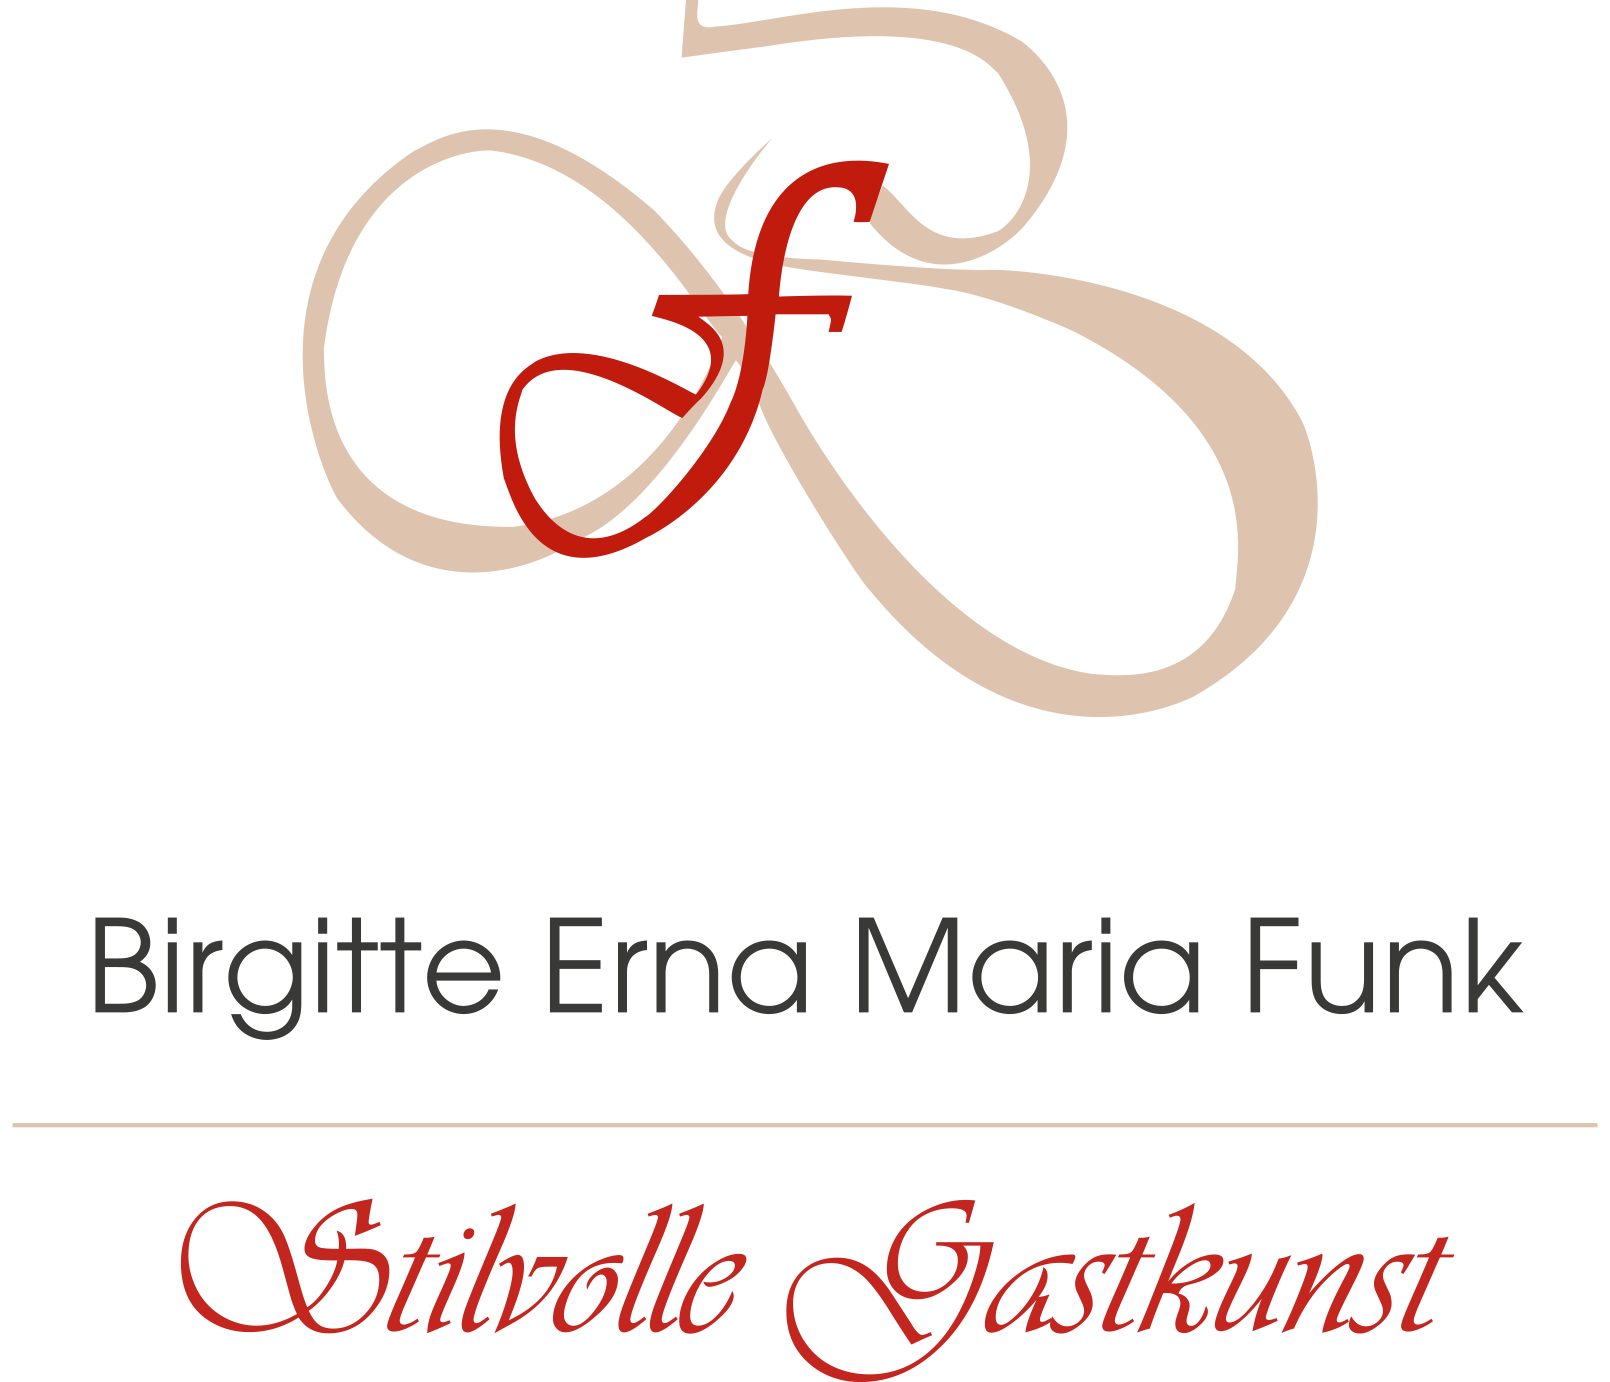 Stilvolle Gastkunst Birgitte Funk